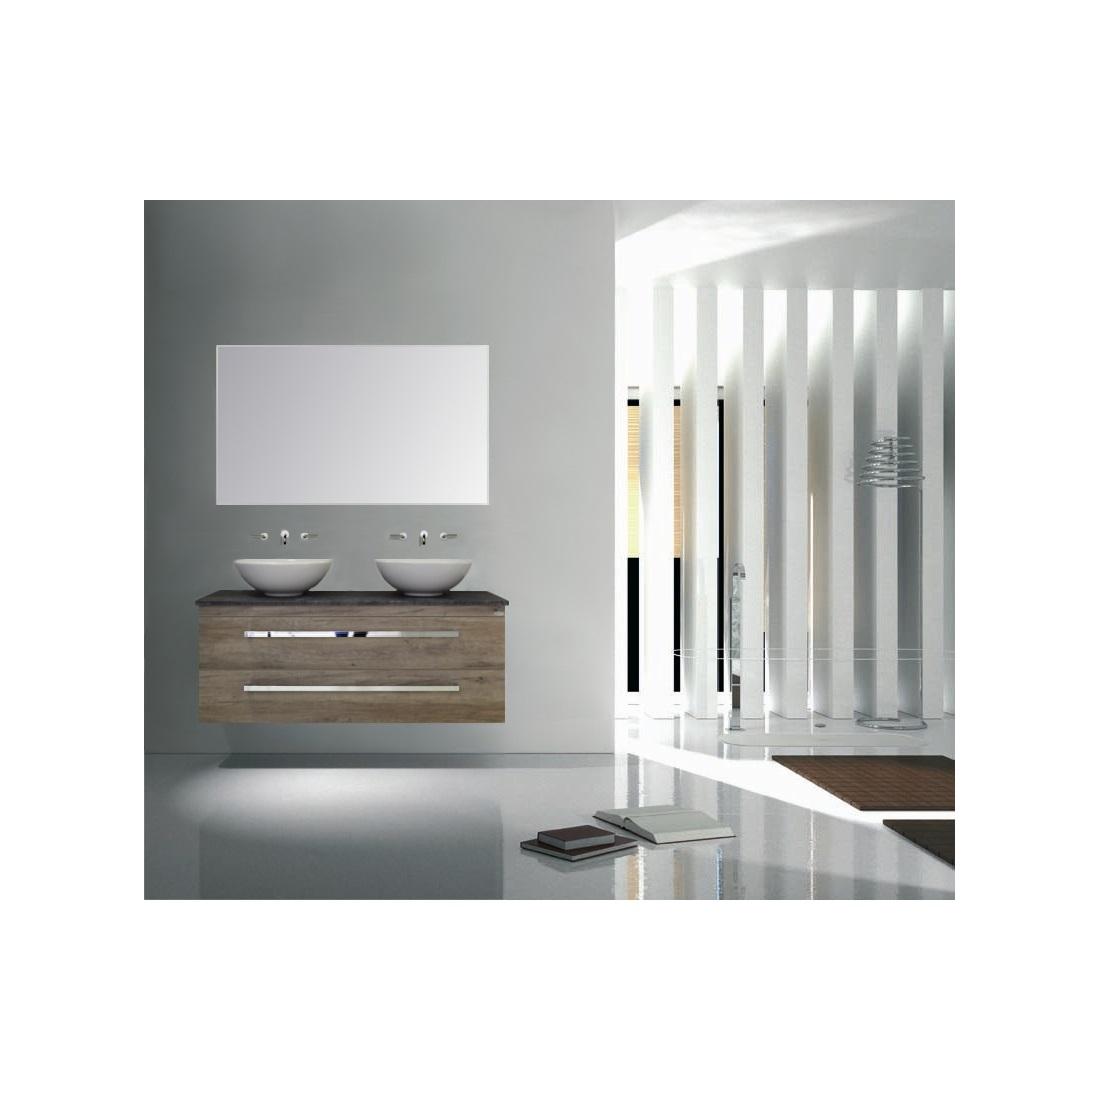 Badkamermeubelset Sanicare Q12 2 Laden Hoogglans Wit (spiegel optioneel)